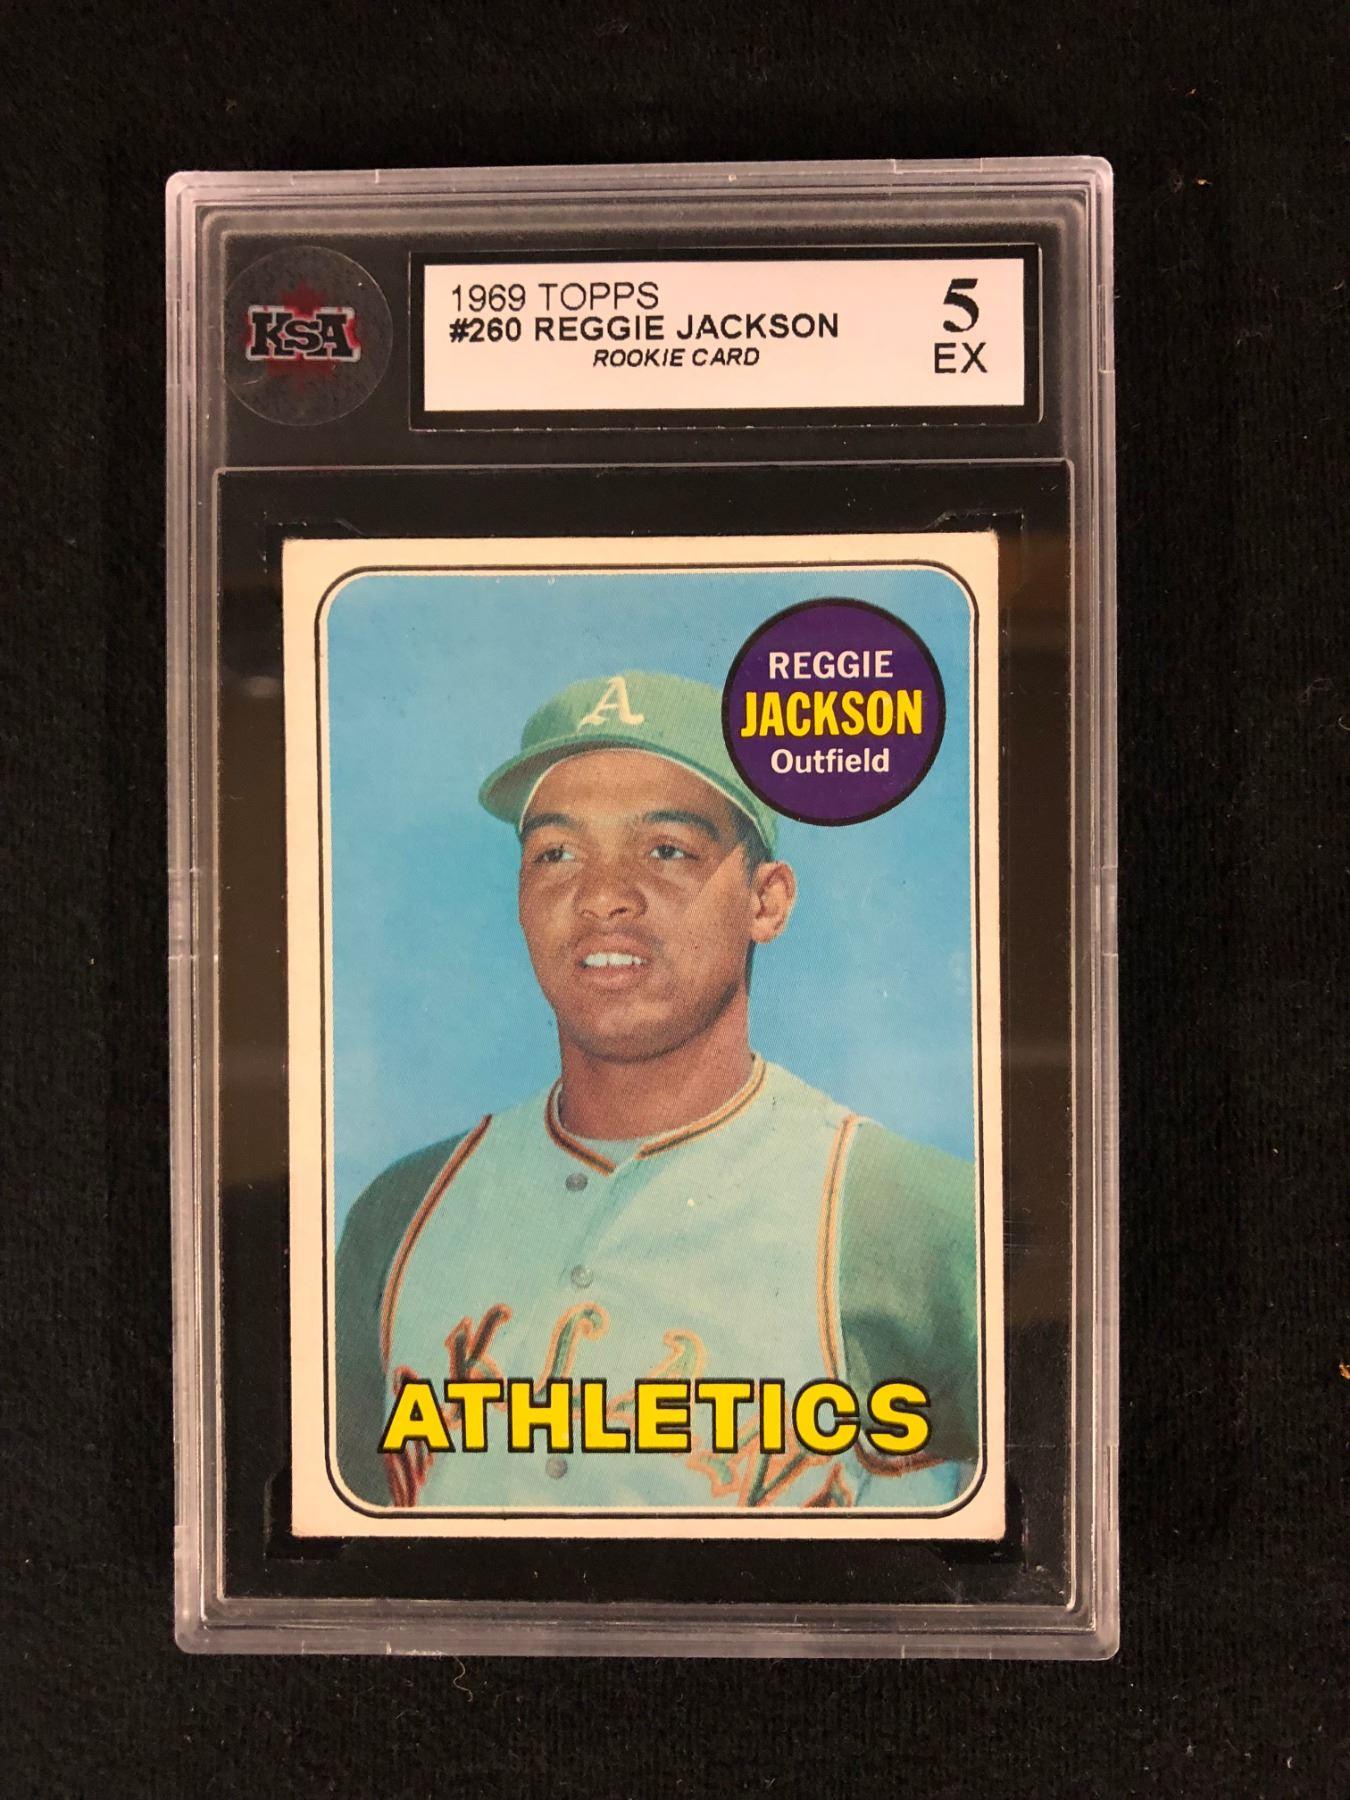 1969 Topps 260 Reggie Jackson Rookie Card 5 Ex Ksa Graded